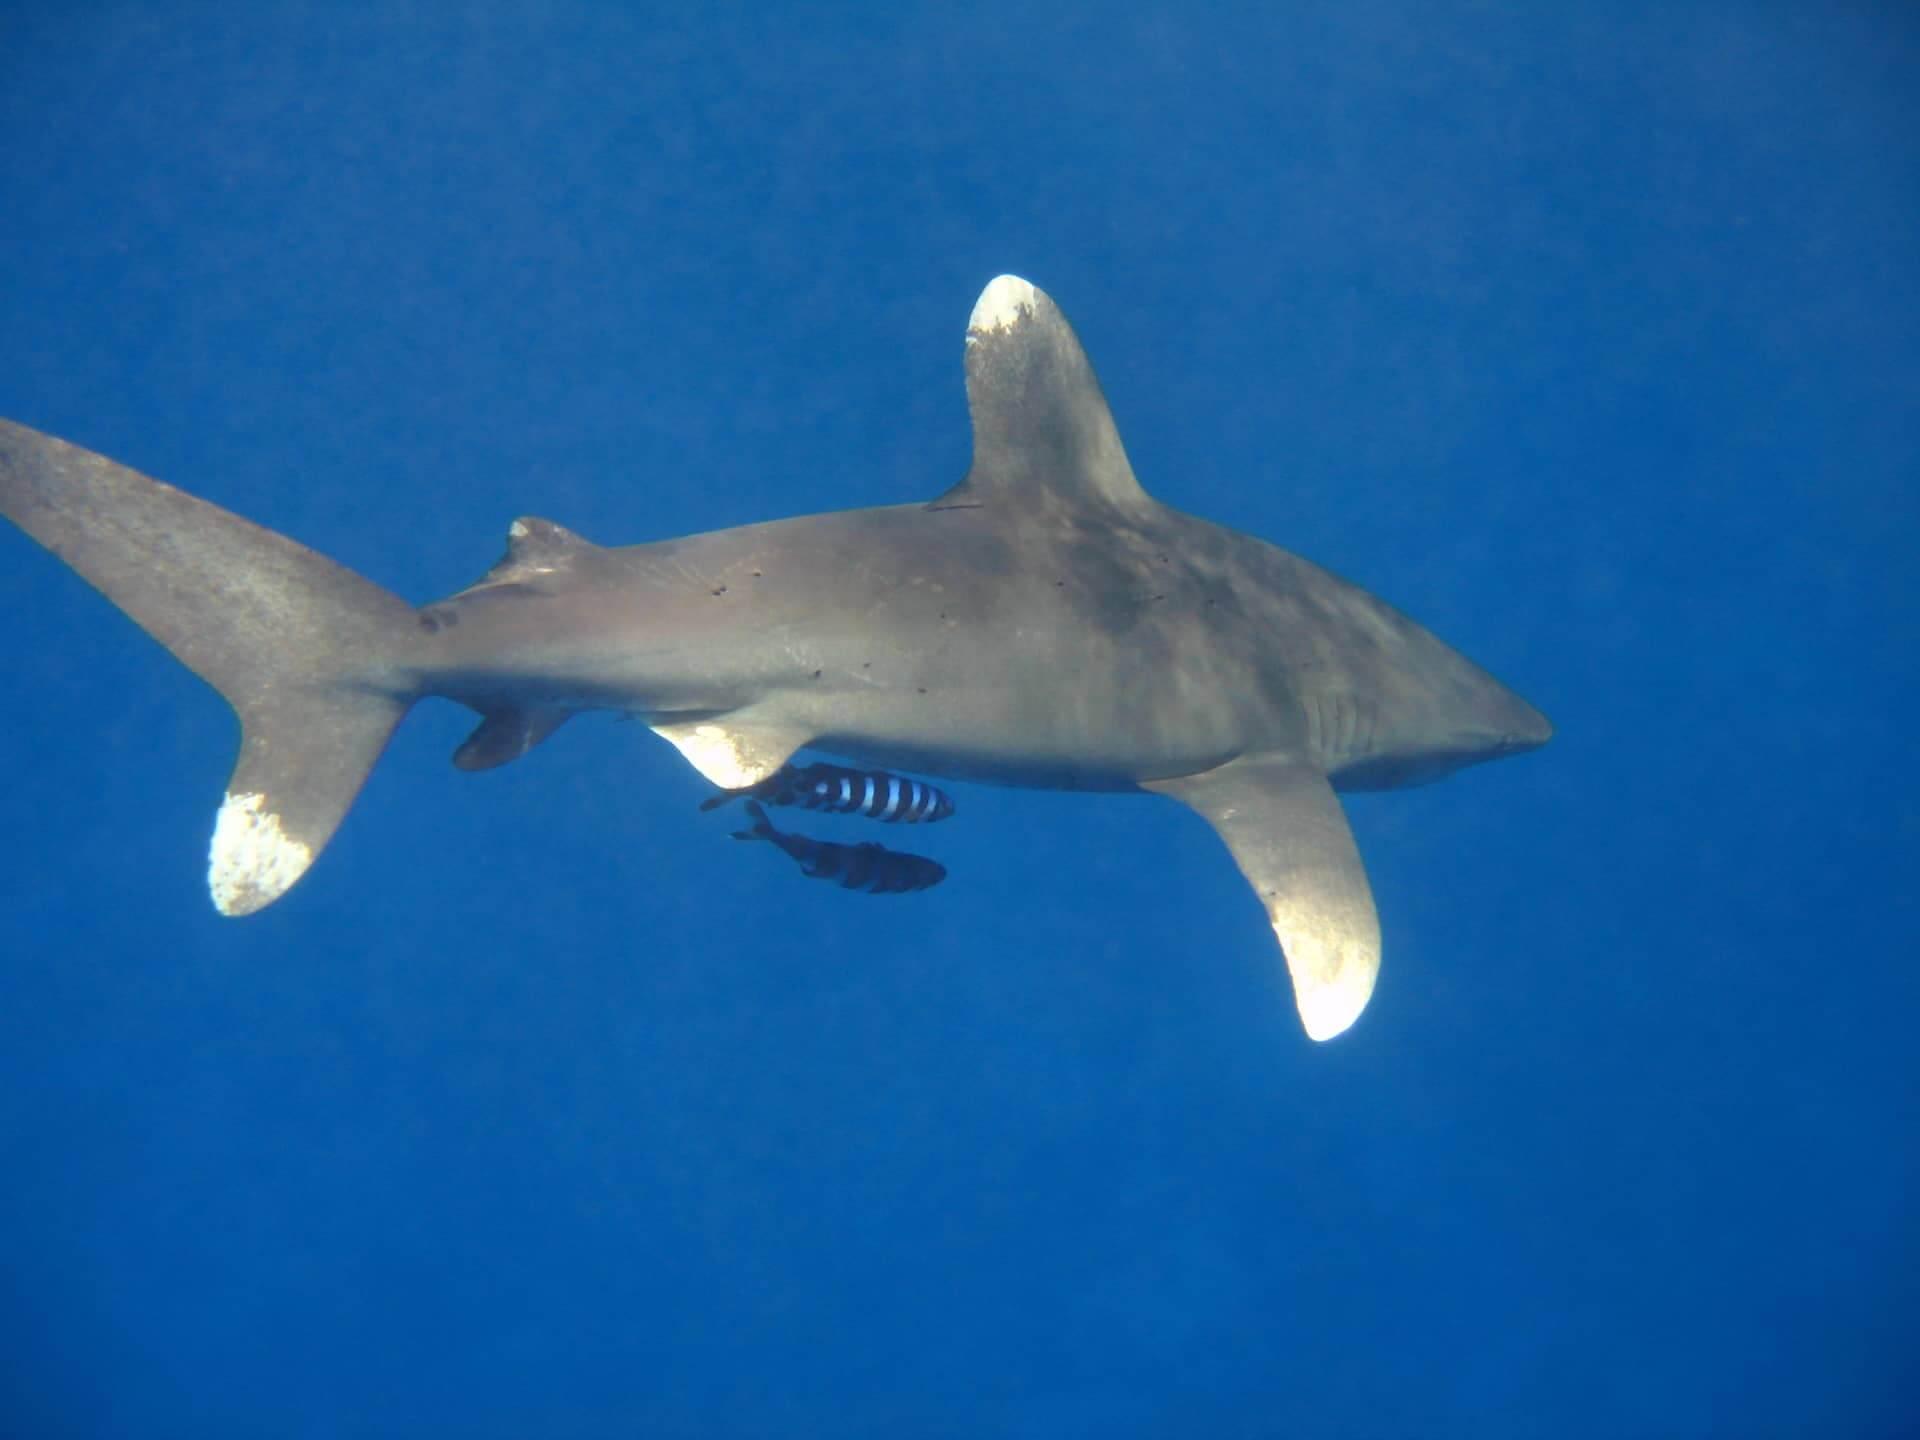 Egypt-REDSEA-Hurghada-DivePro-Academy-Scuba-Diving-Center-Shark-2